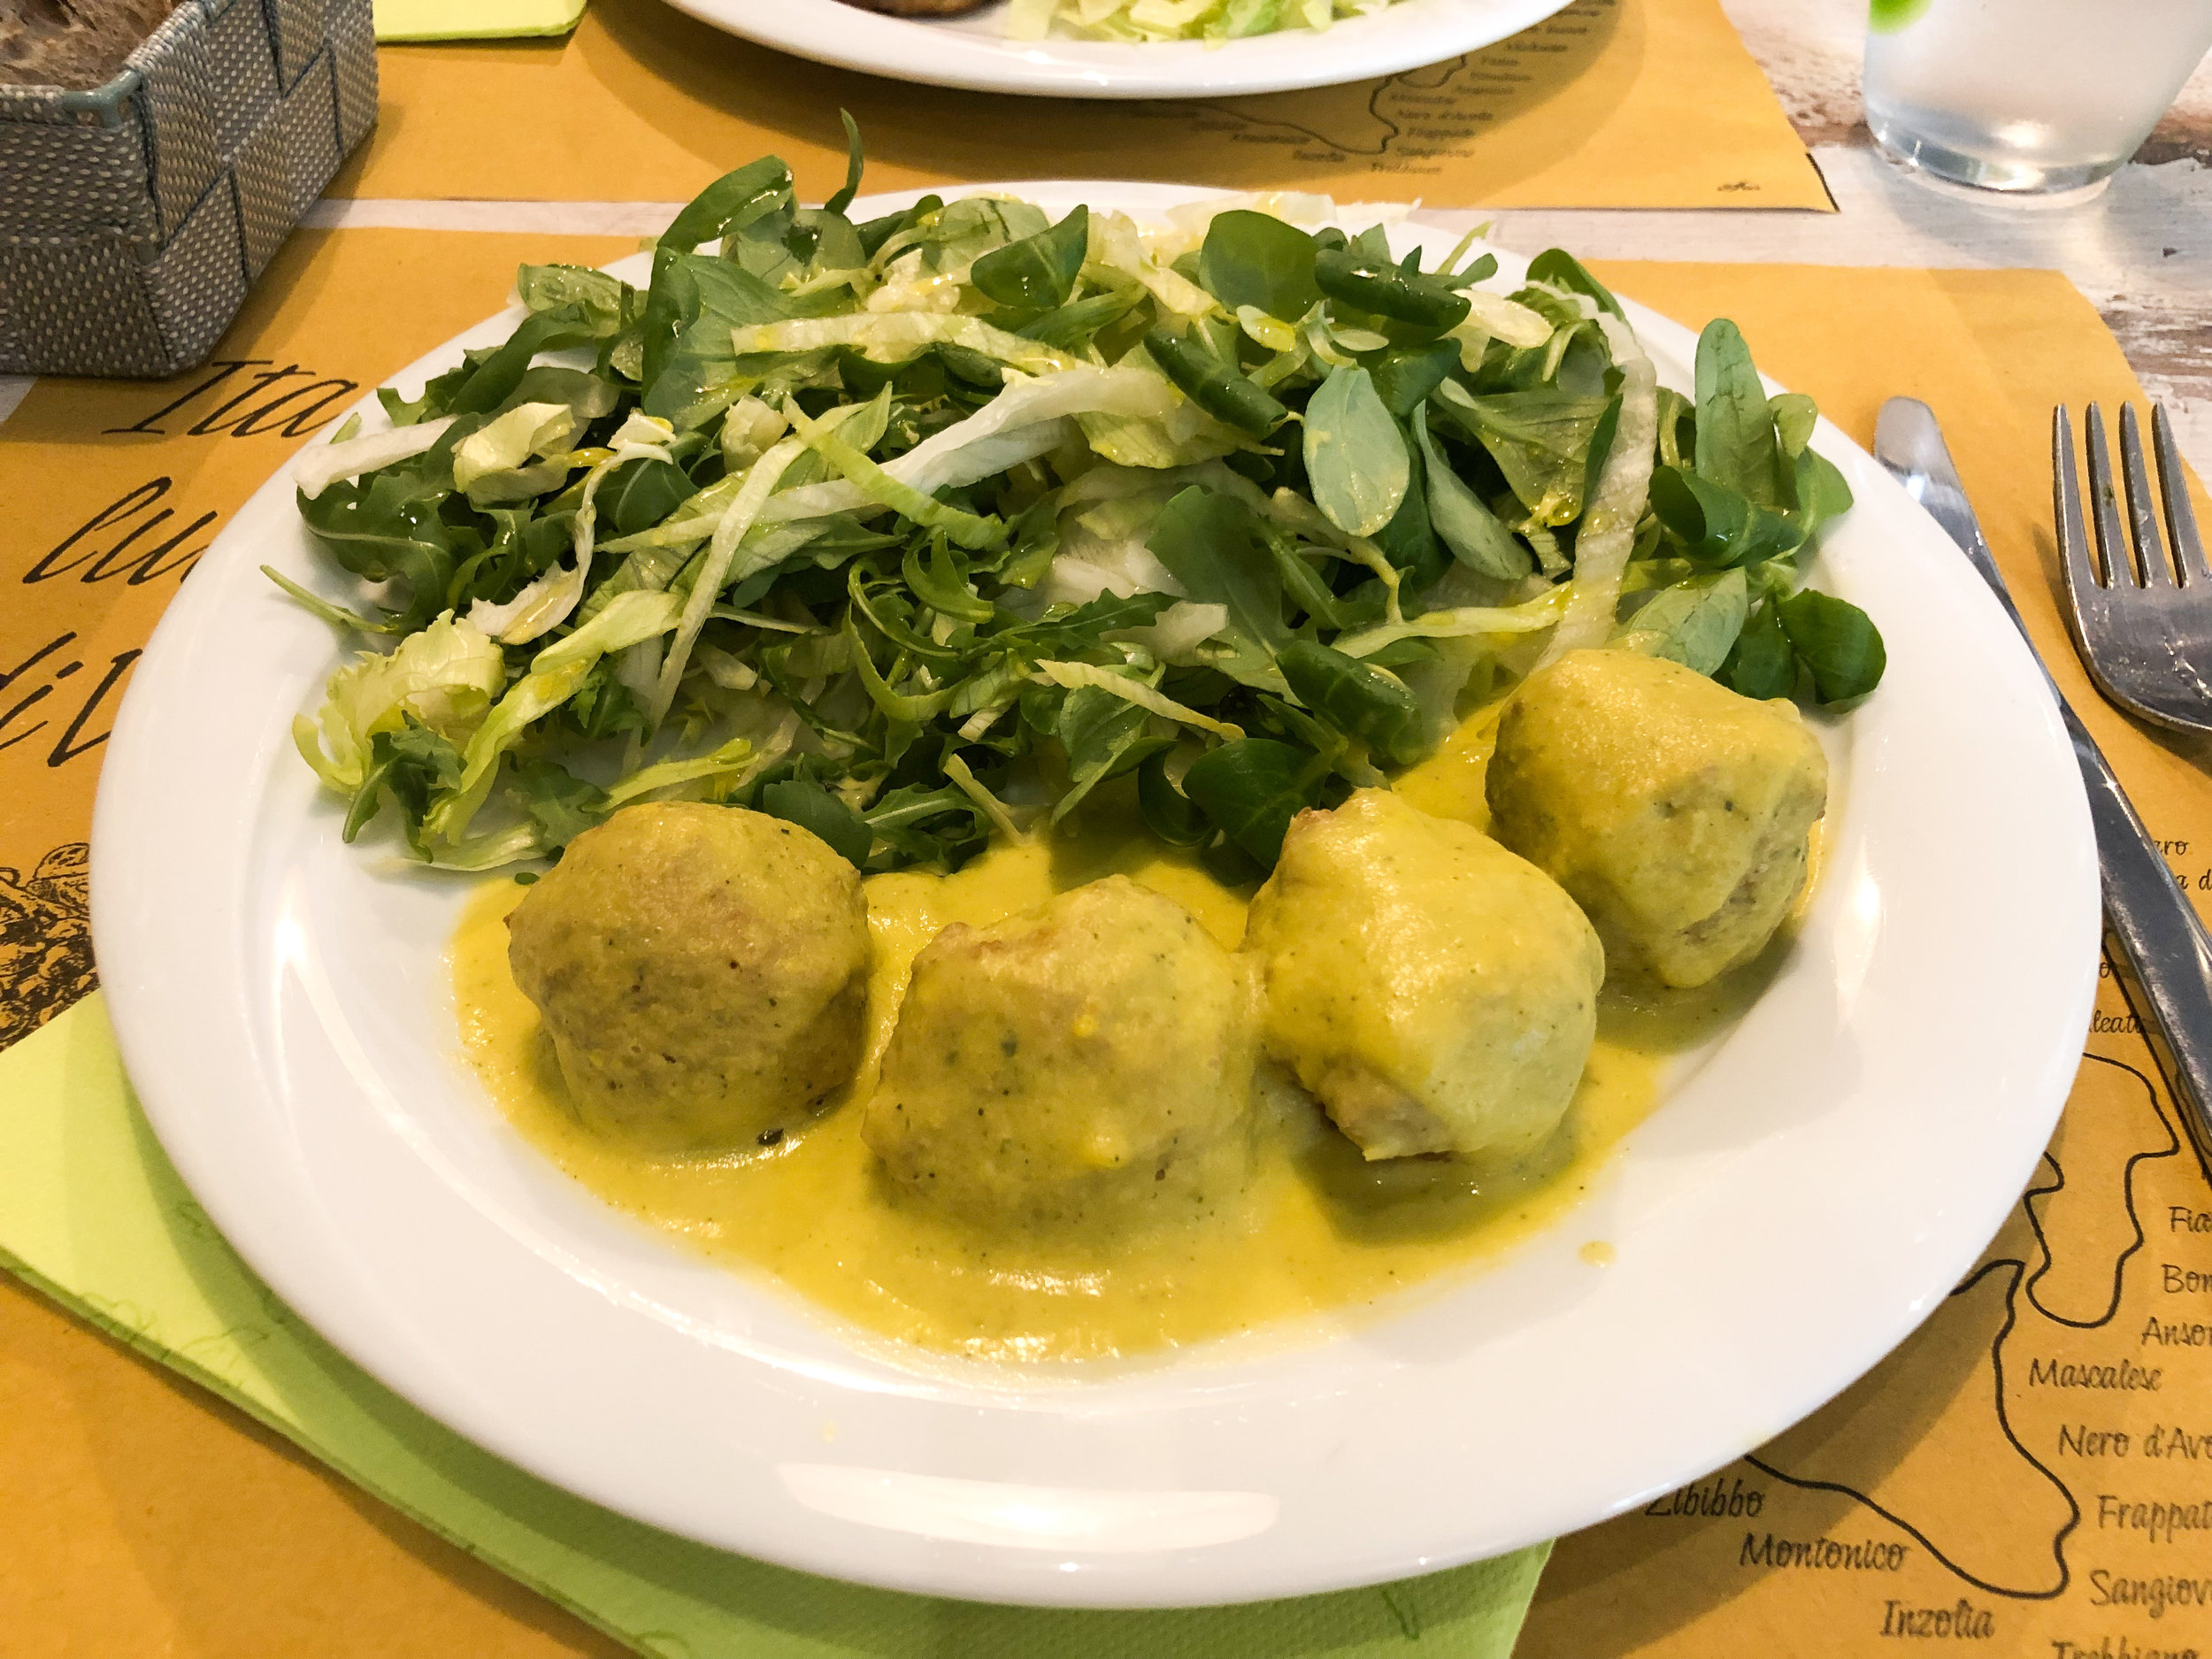 Nirvana Florence Italy | Firenze Italy Vegan + Vegetarian